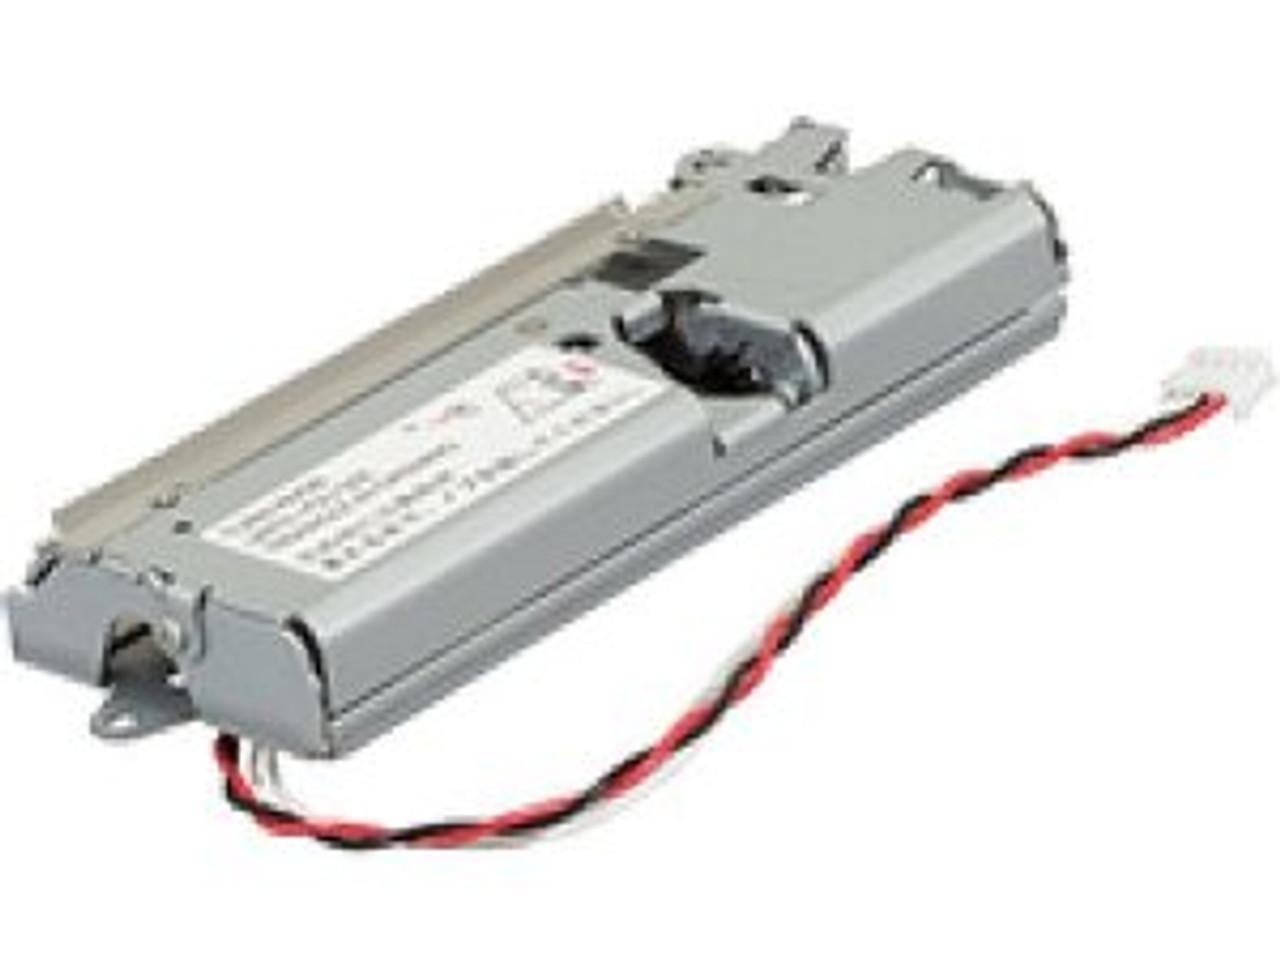 Epson Model M129h Driverwesternagents